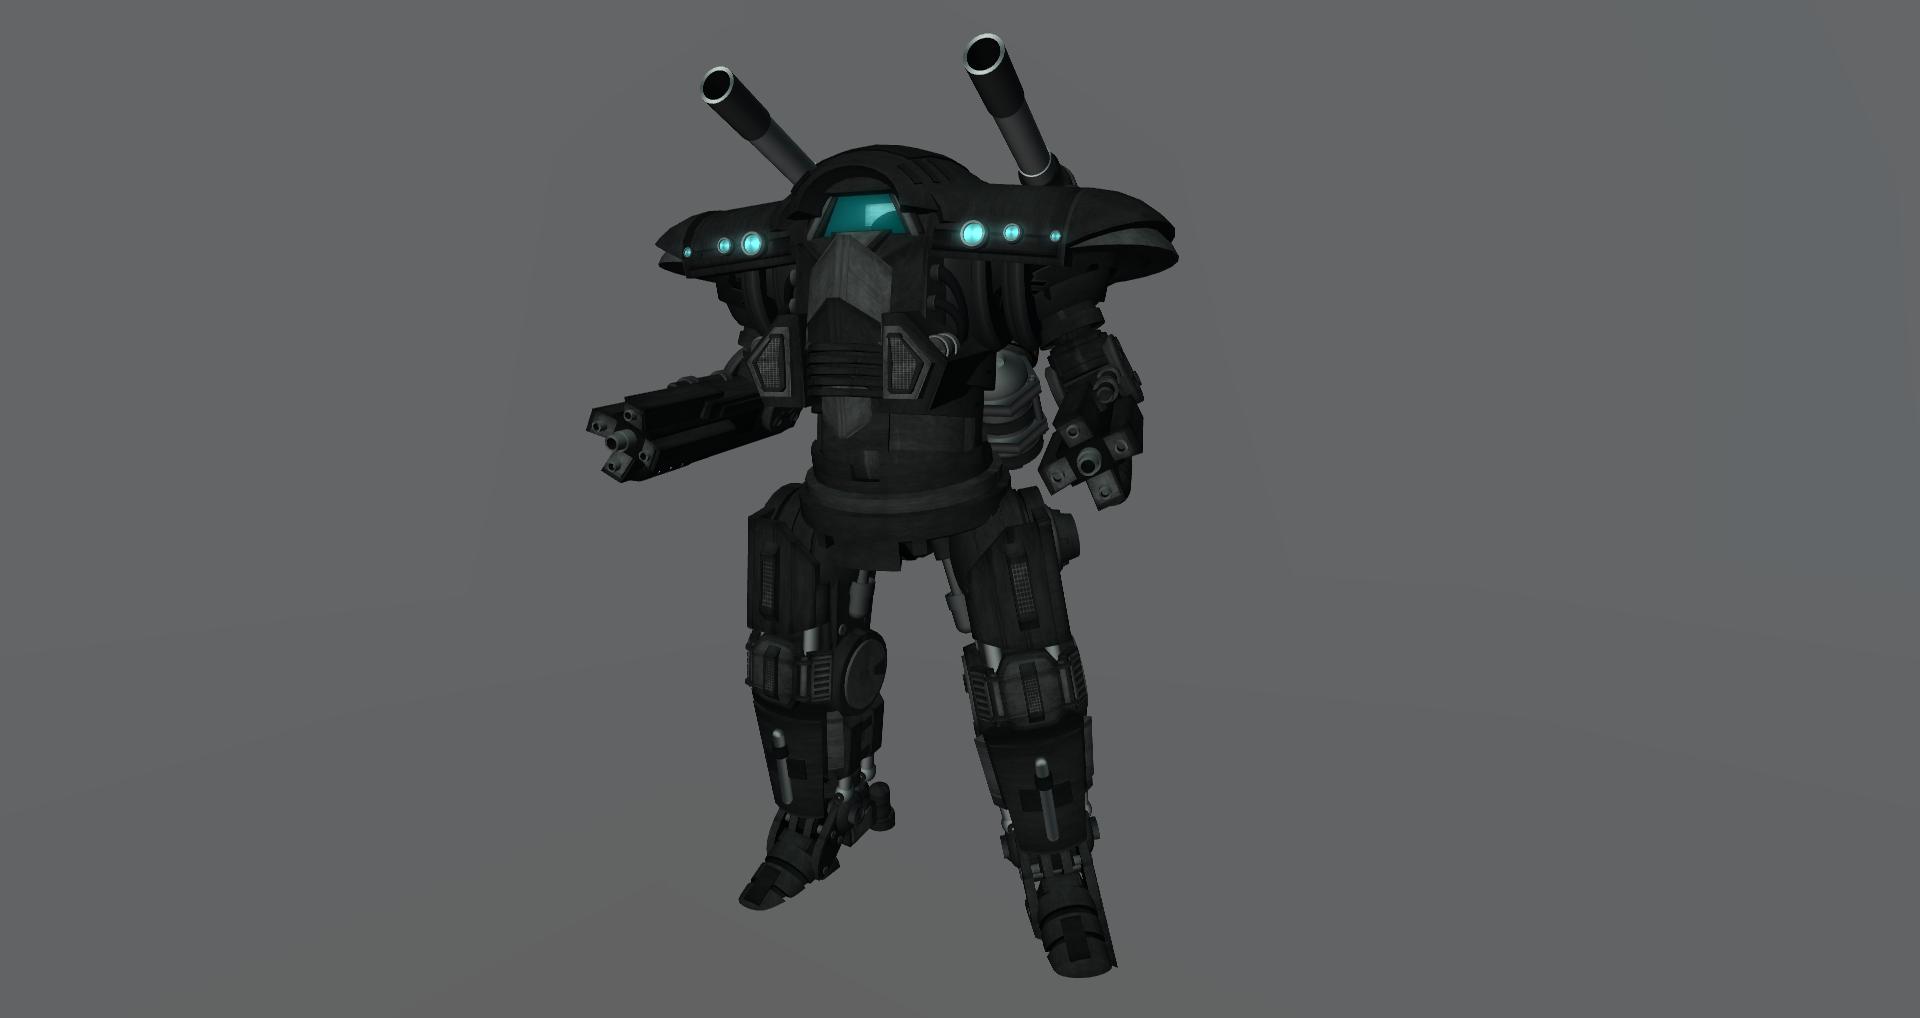 3D Futuristic Armor Suit 1 by Zarthak on DeviantArt